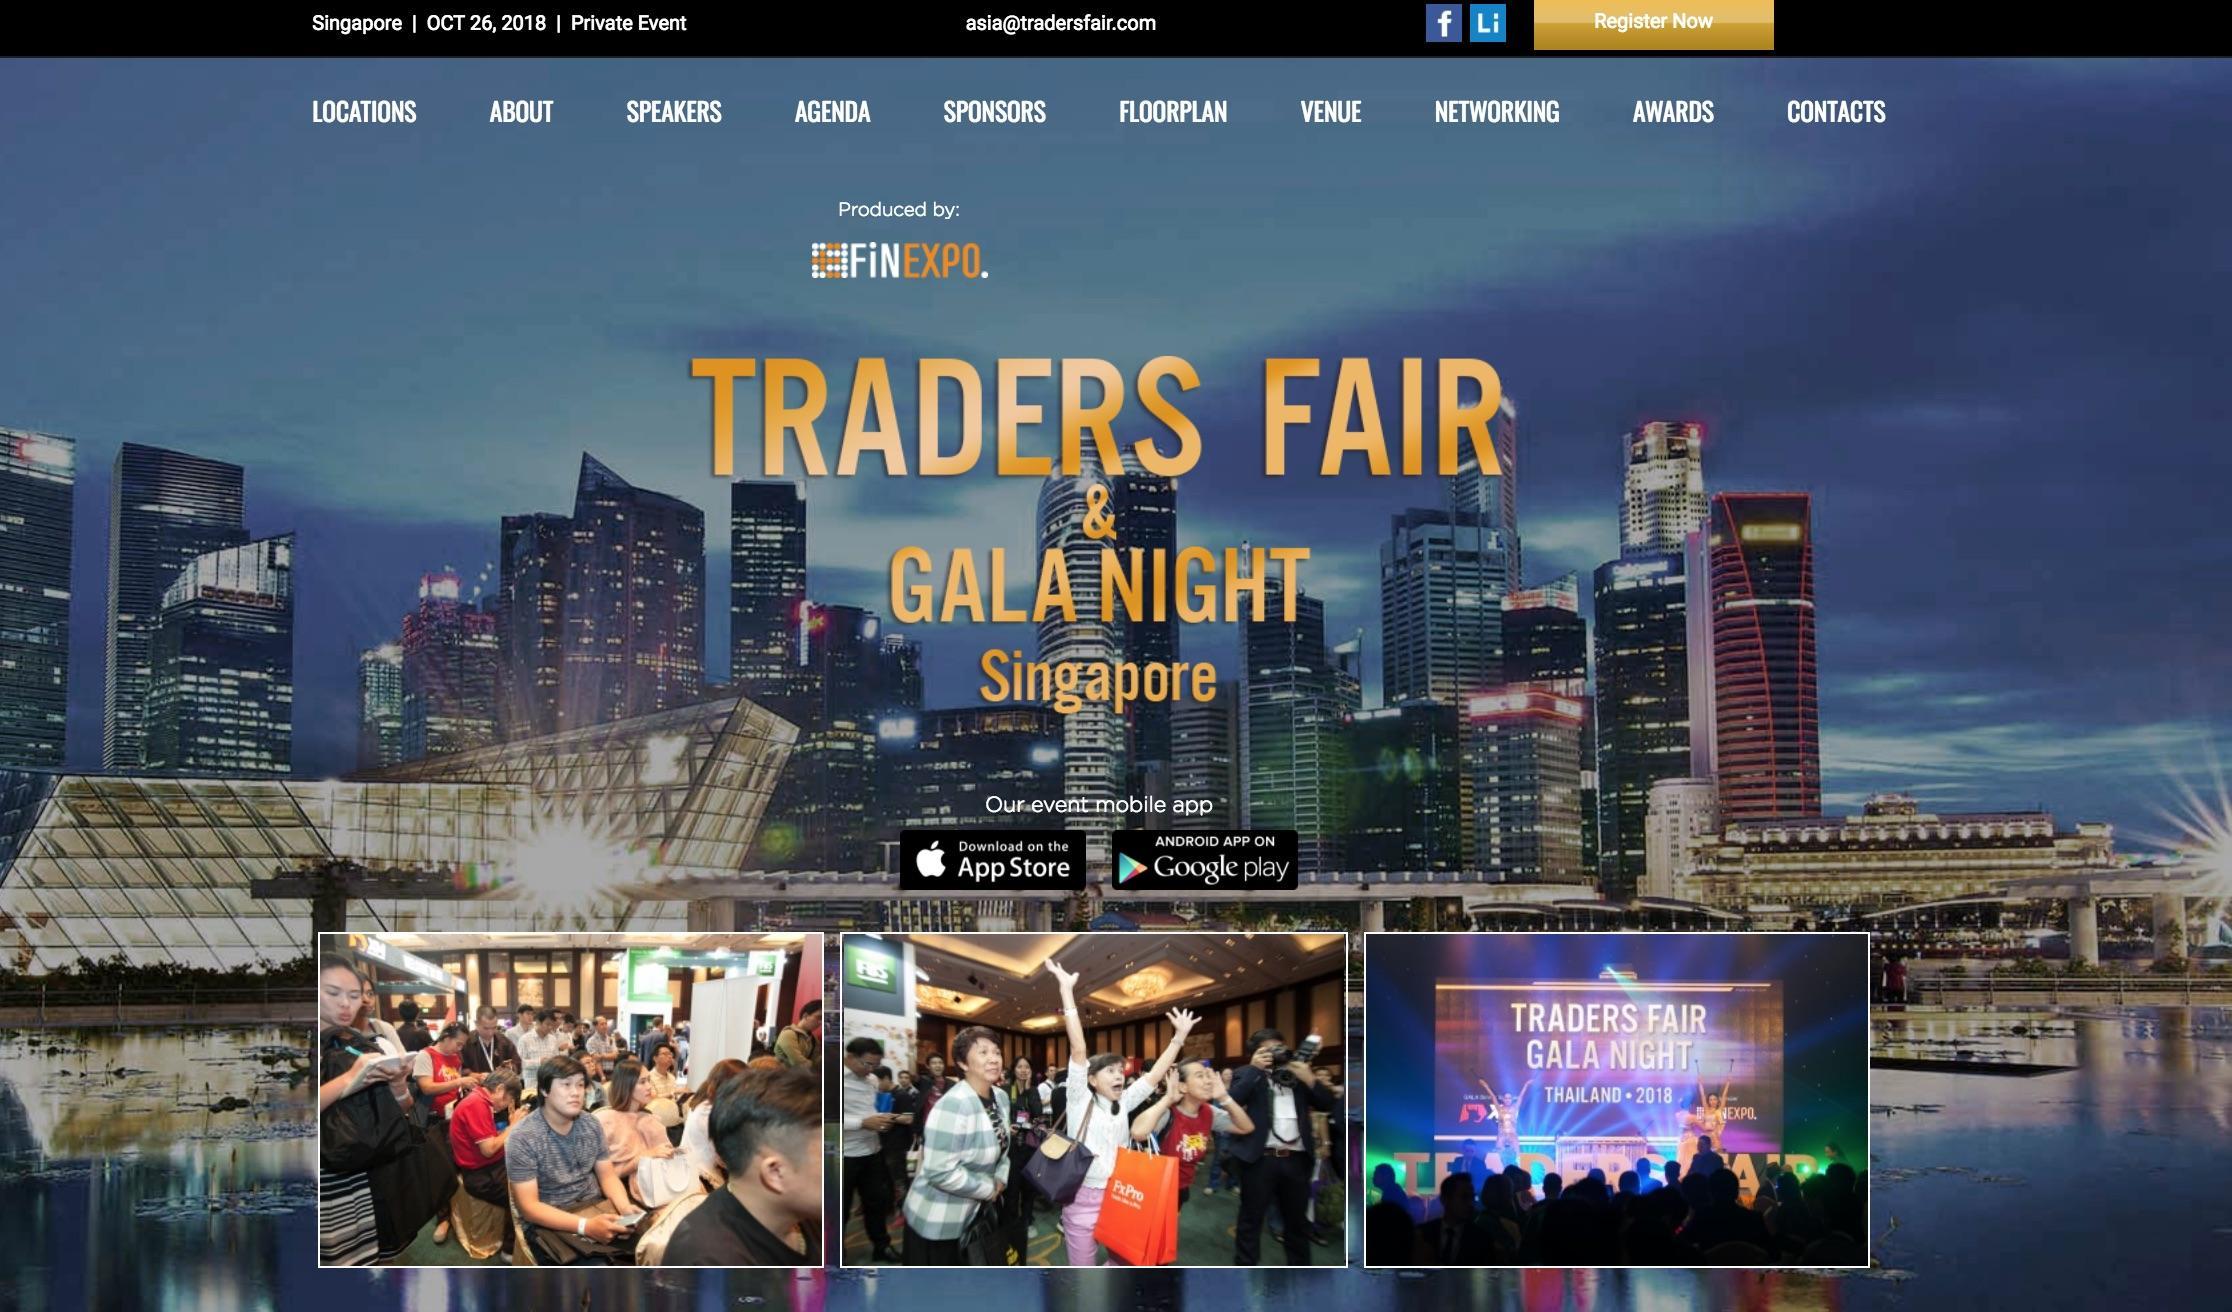 Traders Fair 2018 - Singapore (Financial Even